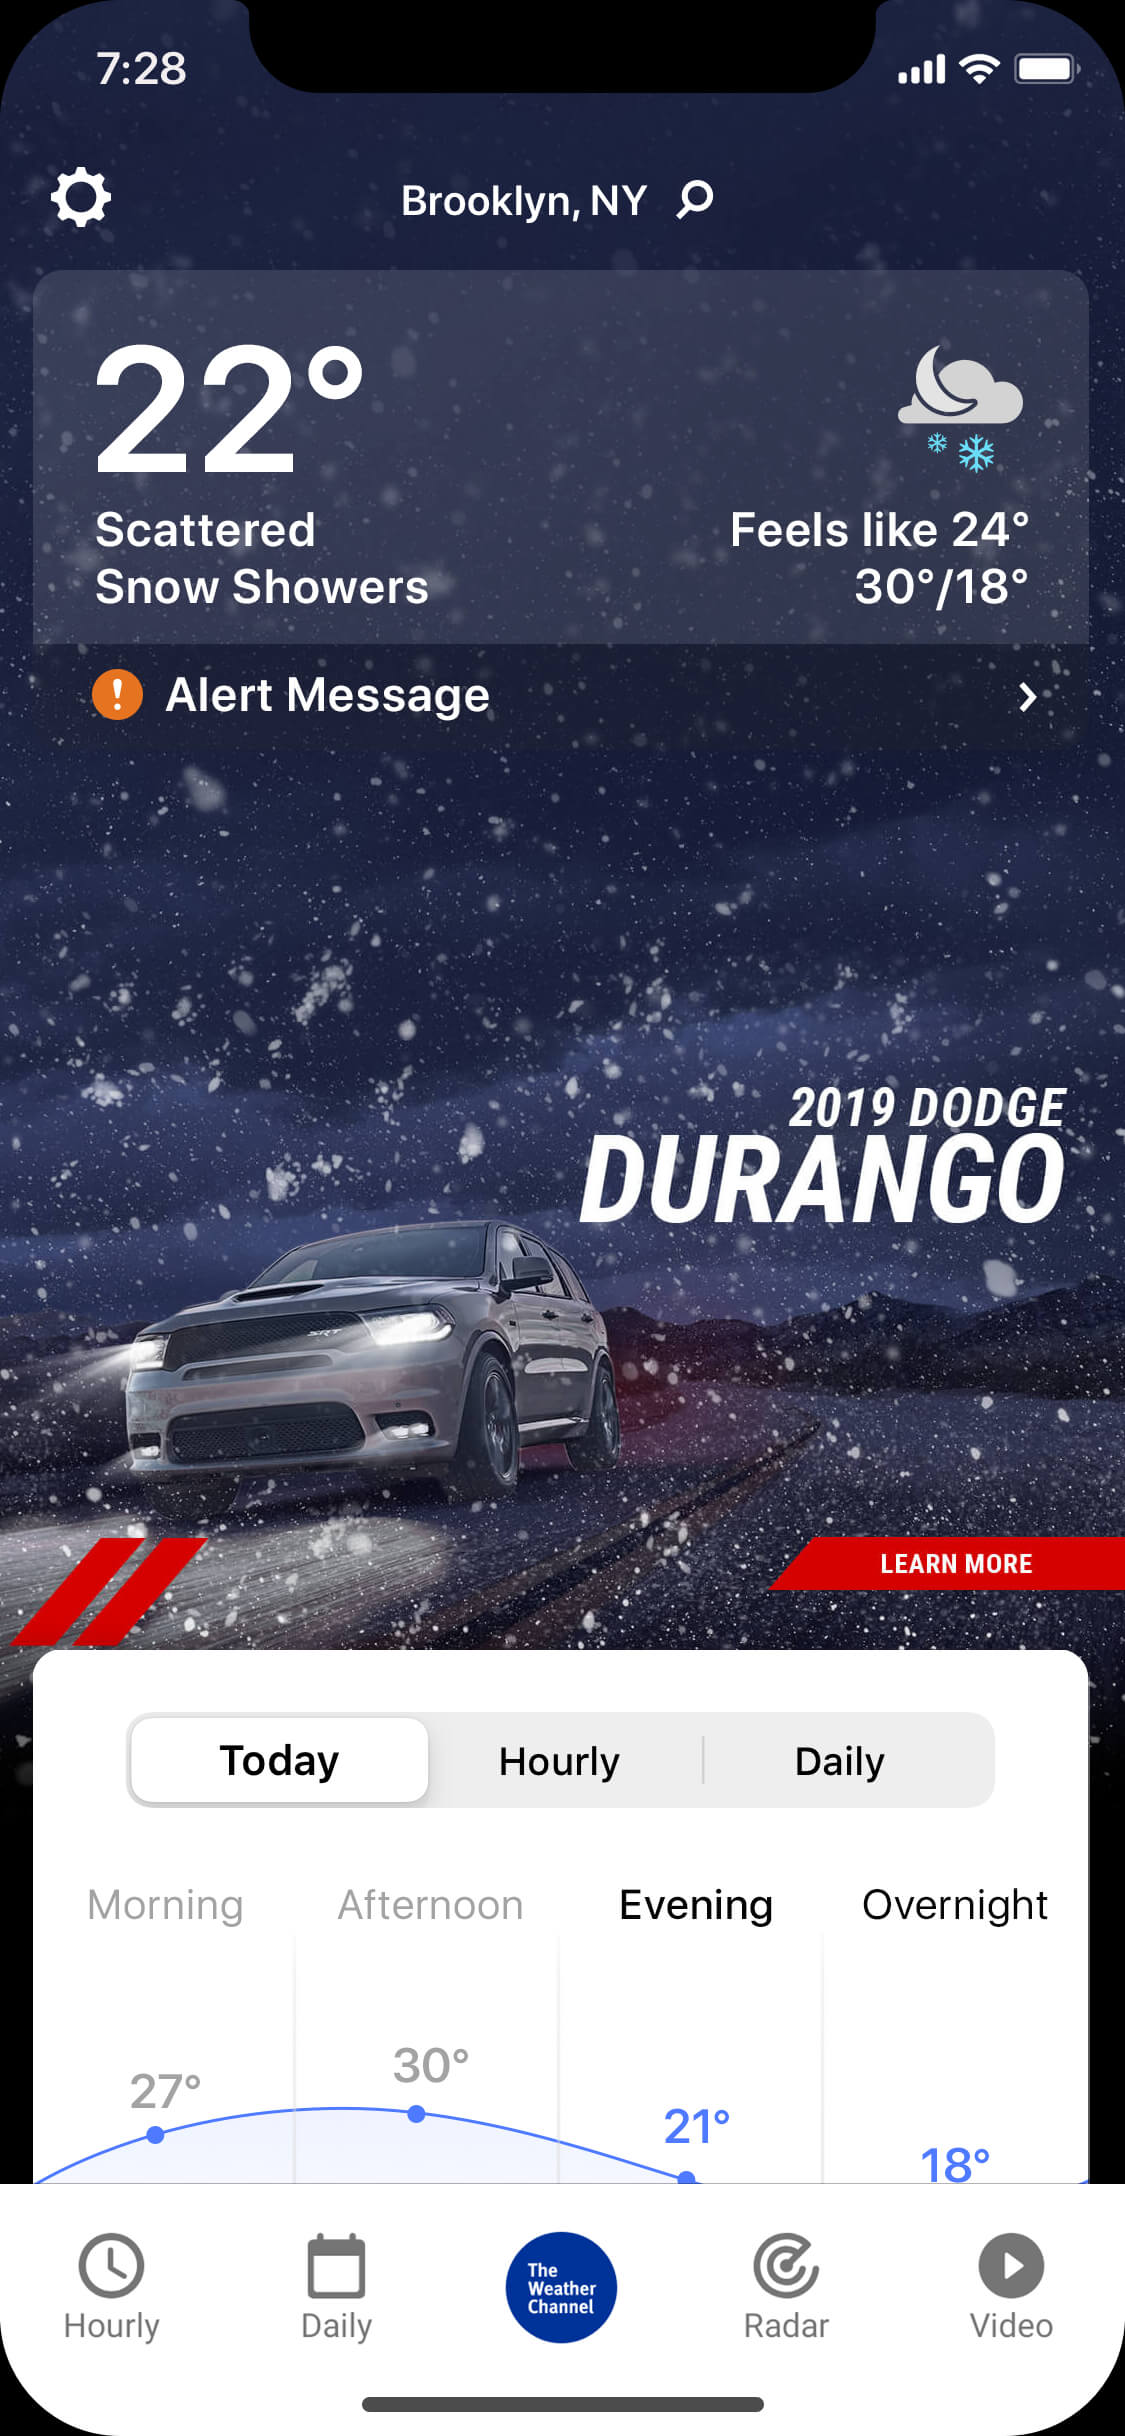 Durango_wintry_night